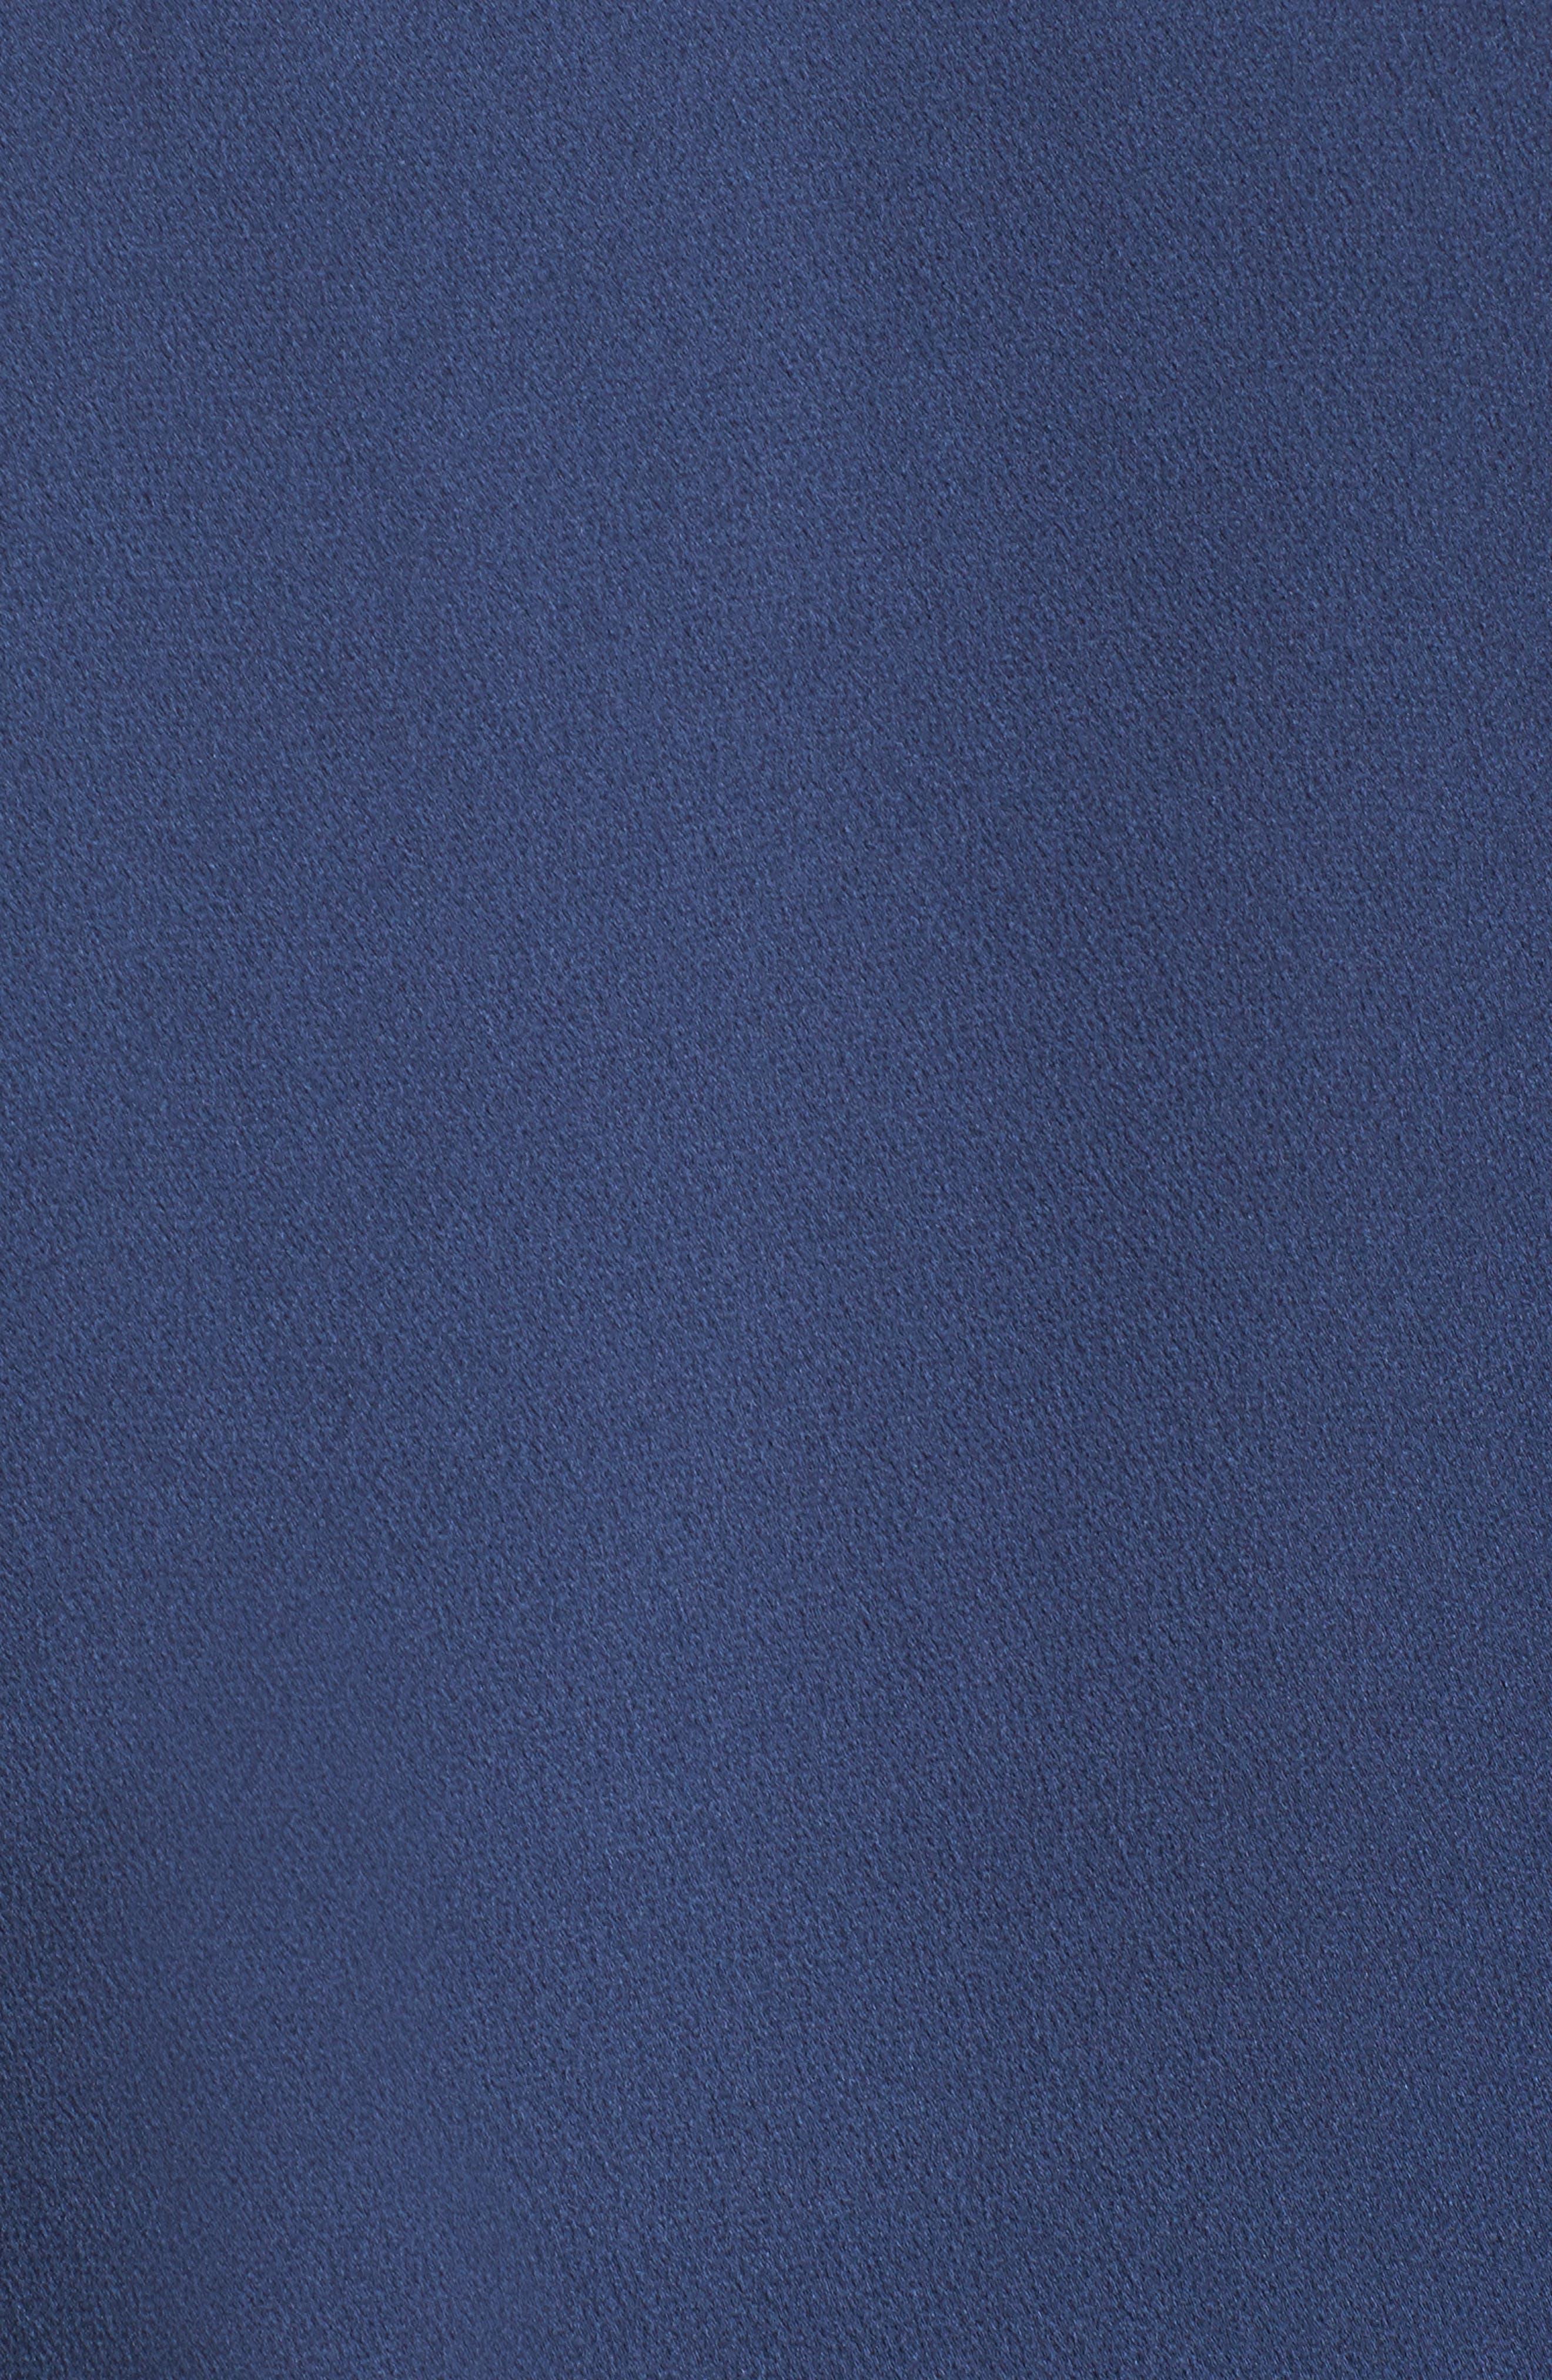 Alternate Image 5  - Vince Camuto Mock Choker Neck Blouse (Plus Size)